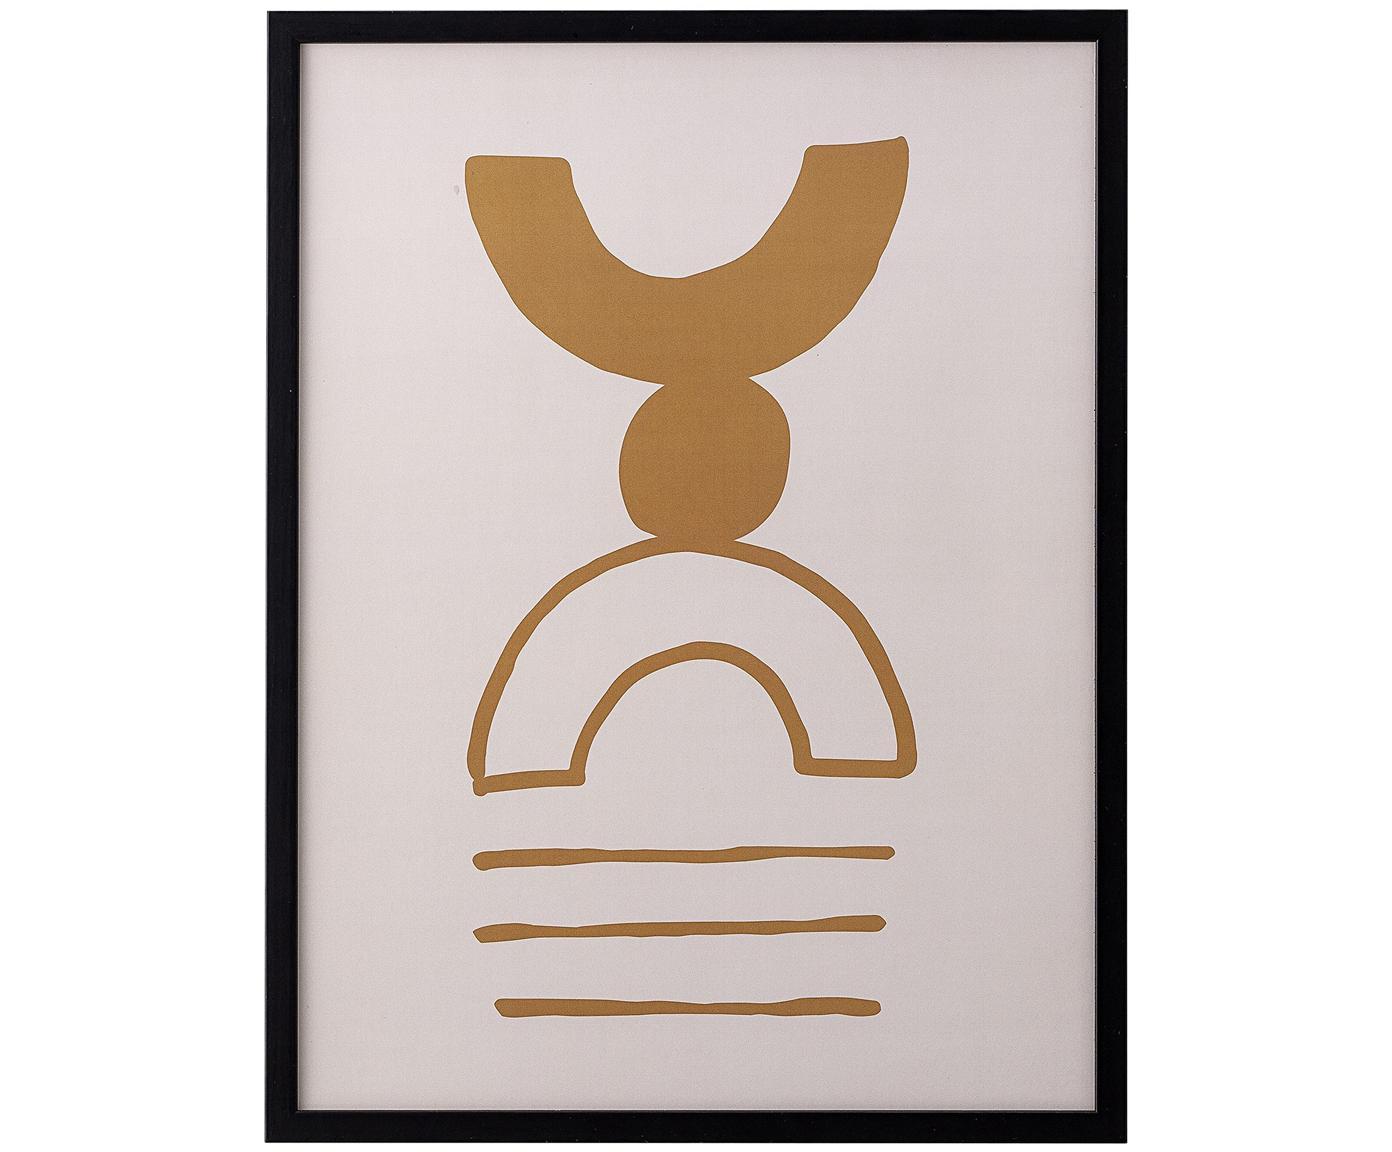 Impresión digital enmarcada Kaya, Beige, marrón, negro, An 32 x Al 42 cm